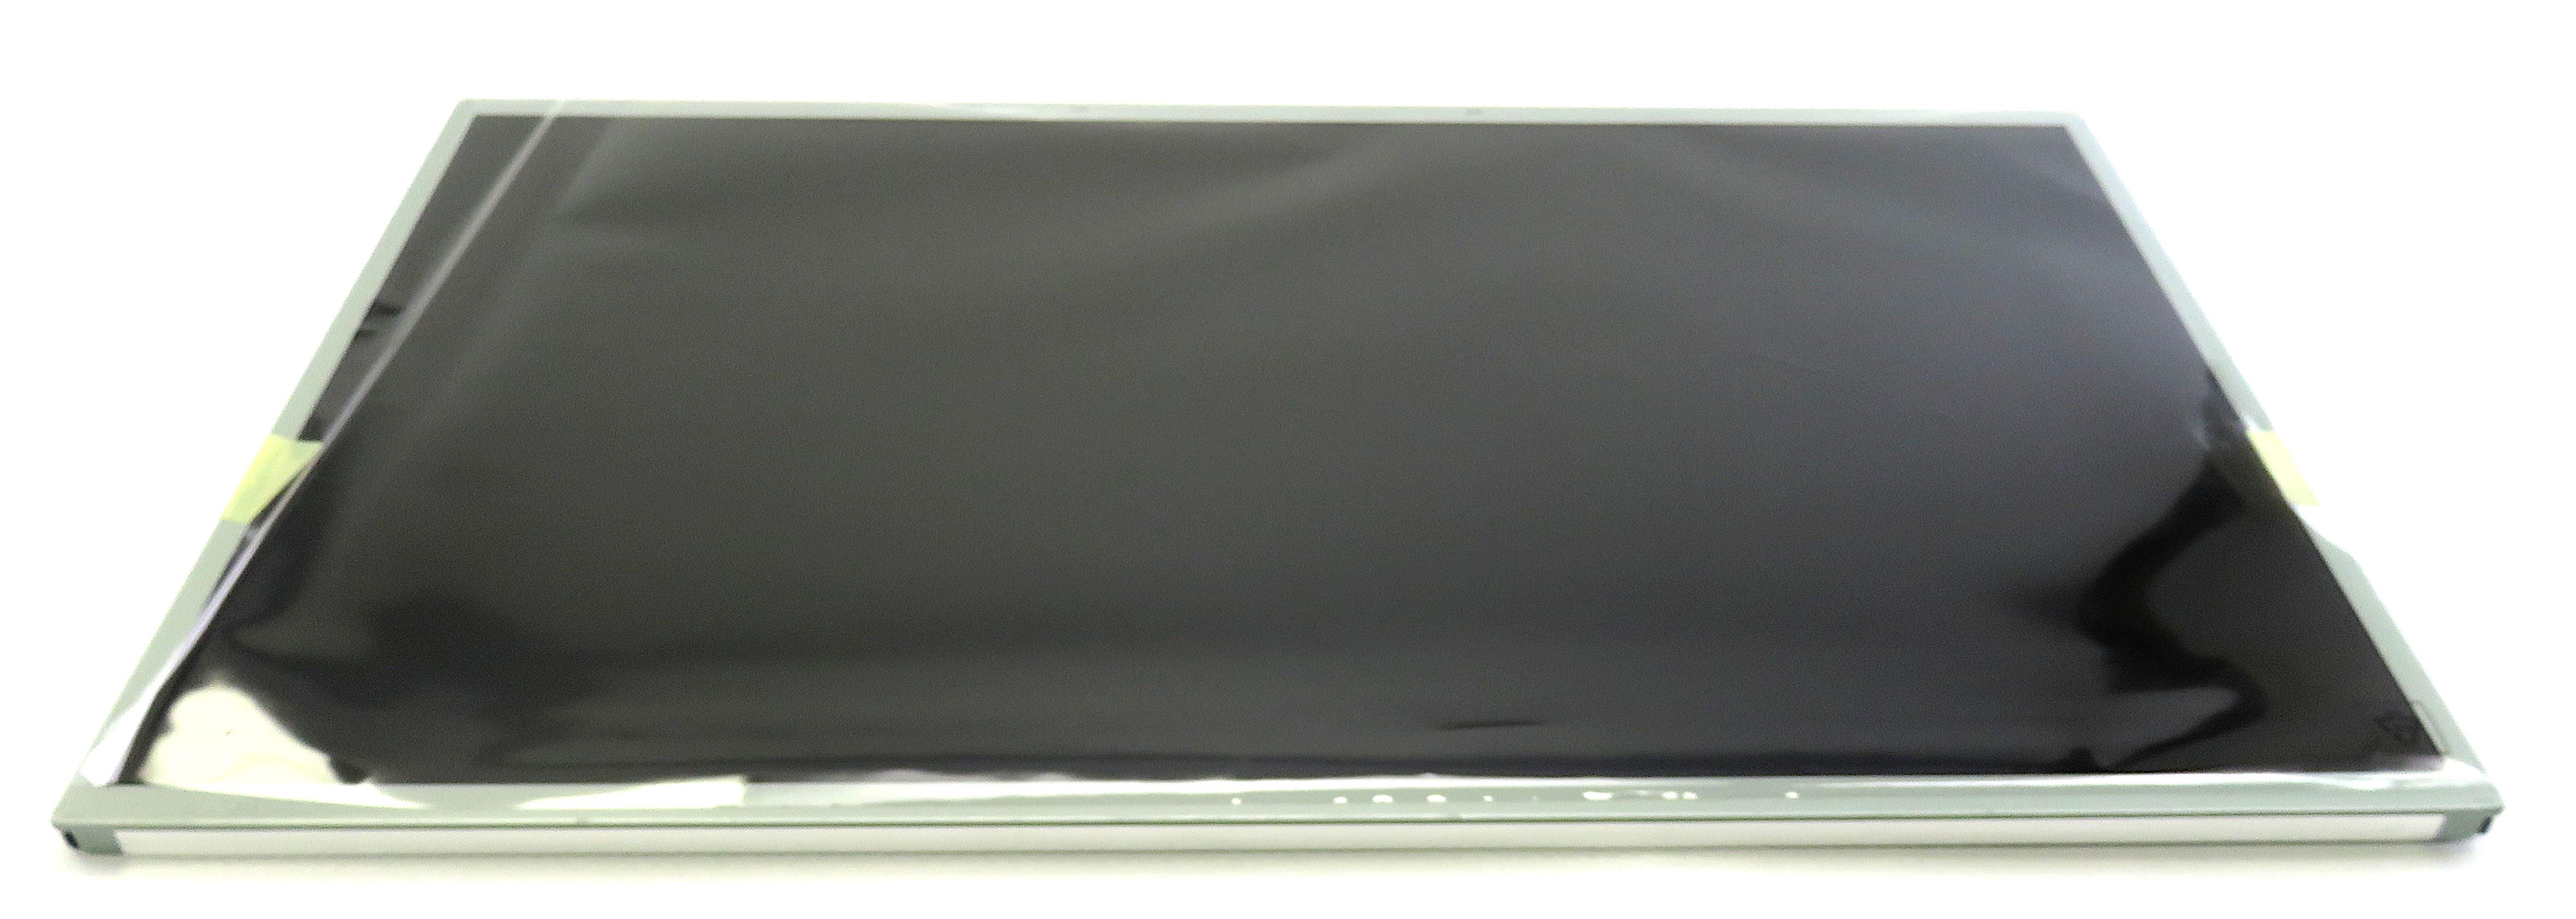 "LM215WF4(TL)(G1) LG 21.5"" Matt LCD AiO Screen Panel"